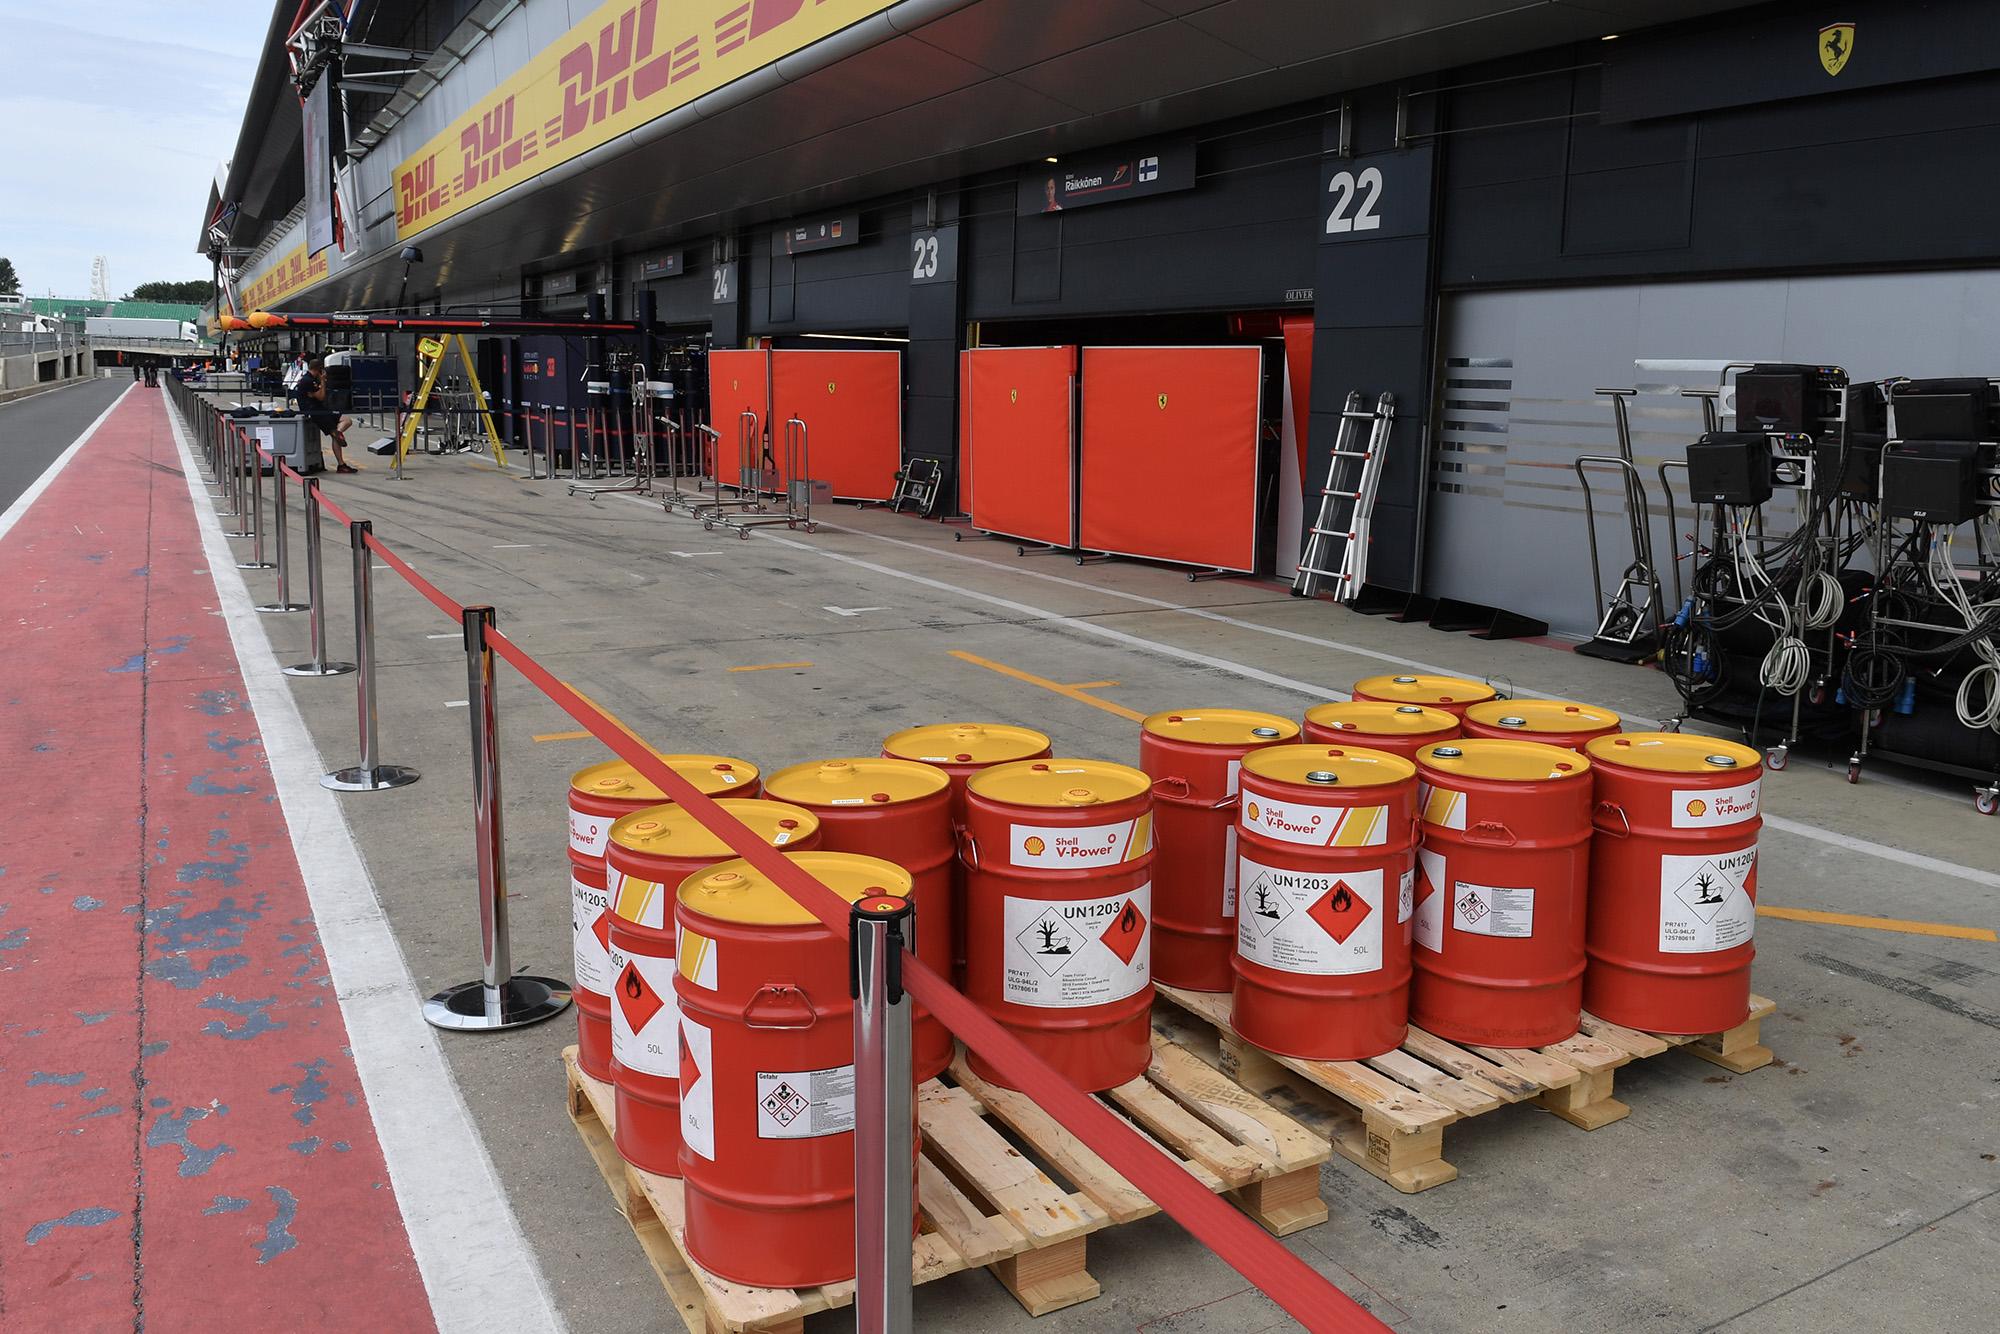 F1 fuel on pallet